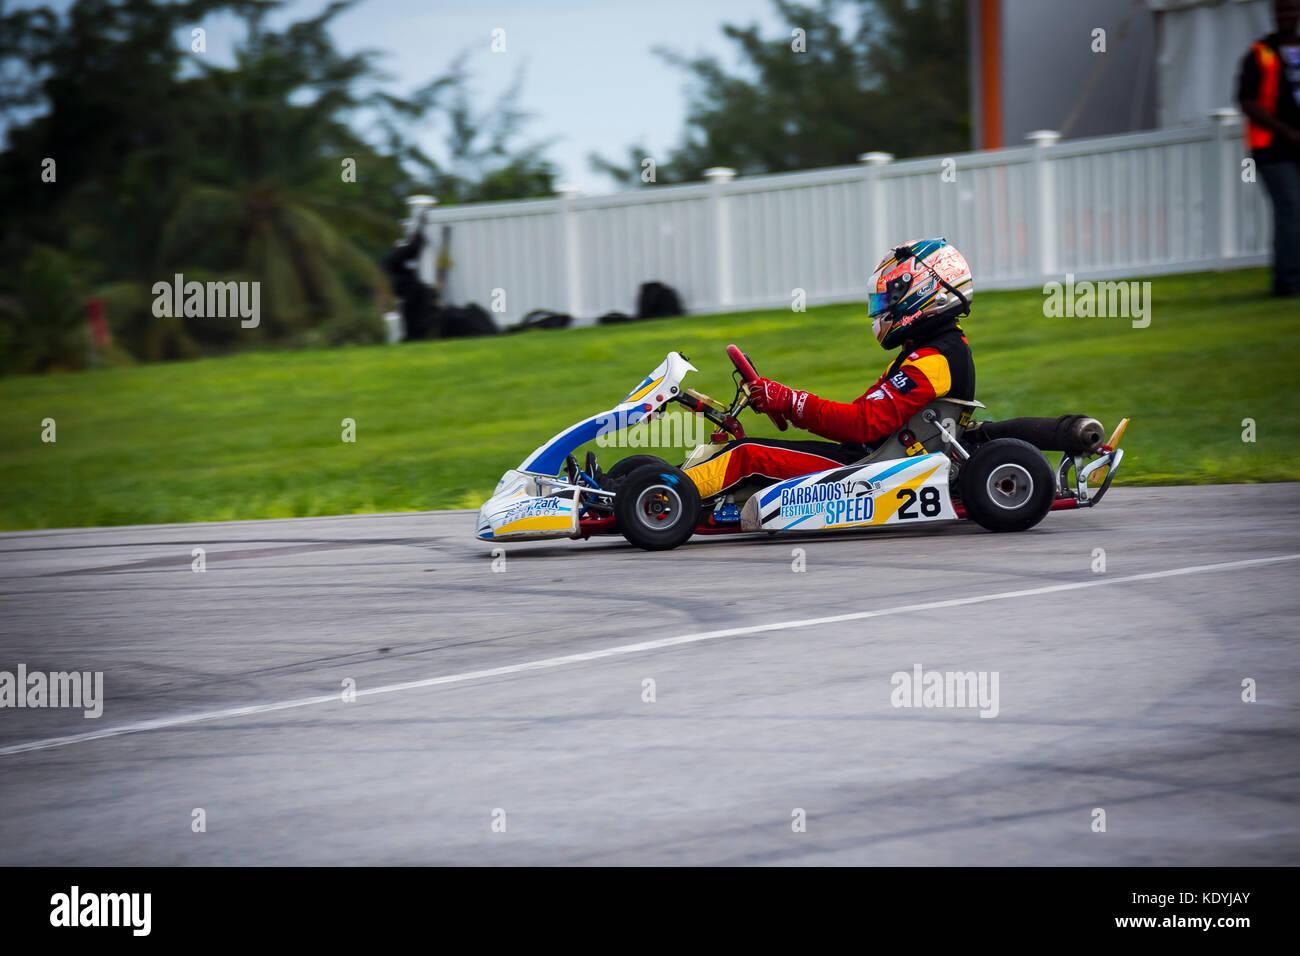 Barbados Festival Of Speed 2017; Bushy Park Racing Circuit; Bushy Park; St. Phillip; Barbados; Saturday 14th October - Stock Image